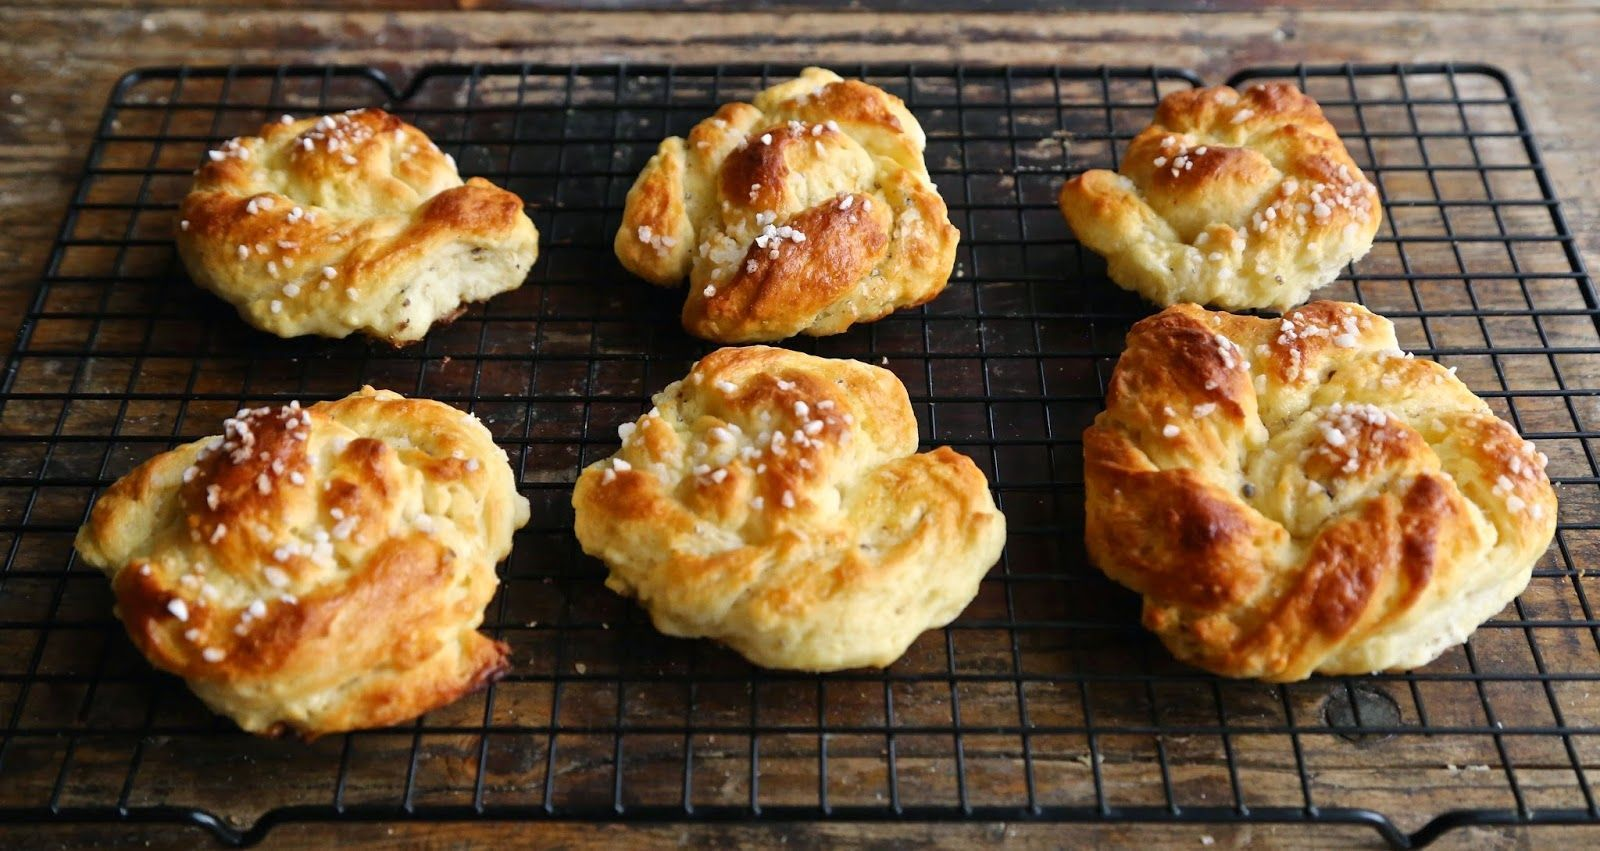 Swedish cardamom buns recipe for John Cleese #cardamombuns MsMarmiteLover: Swedish cardamom buns recipe for John Cleese #cardamombuns Swedish cardamom buns recipe for John Cleese #cardamombuns MsMarmiteLover: Swedish cardamom buns recipe for John Cleese #cardamombuns Swedish cardamom buns recipe for John Cleese #cardamombuns MsMarmiteLover: Swedish cardamom buns recipe for John Cleese #cardamombuns Swedish cardamom buns recipe for John Cleese #cardamombuns MsMarmiteLover: Swedish cardamom buns r #cardamombuns